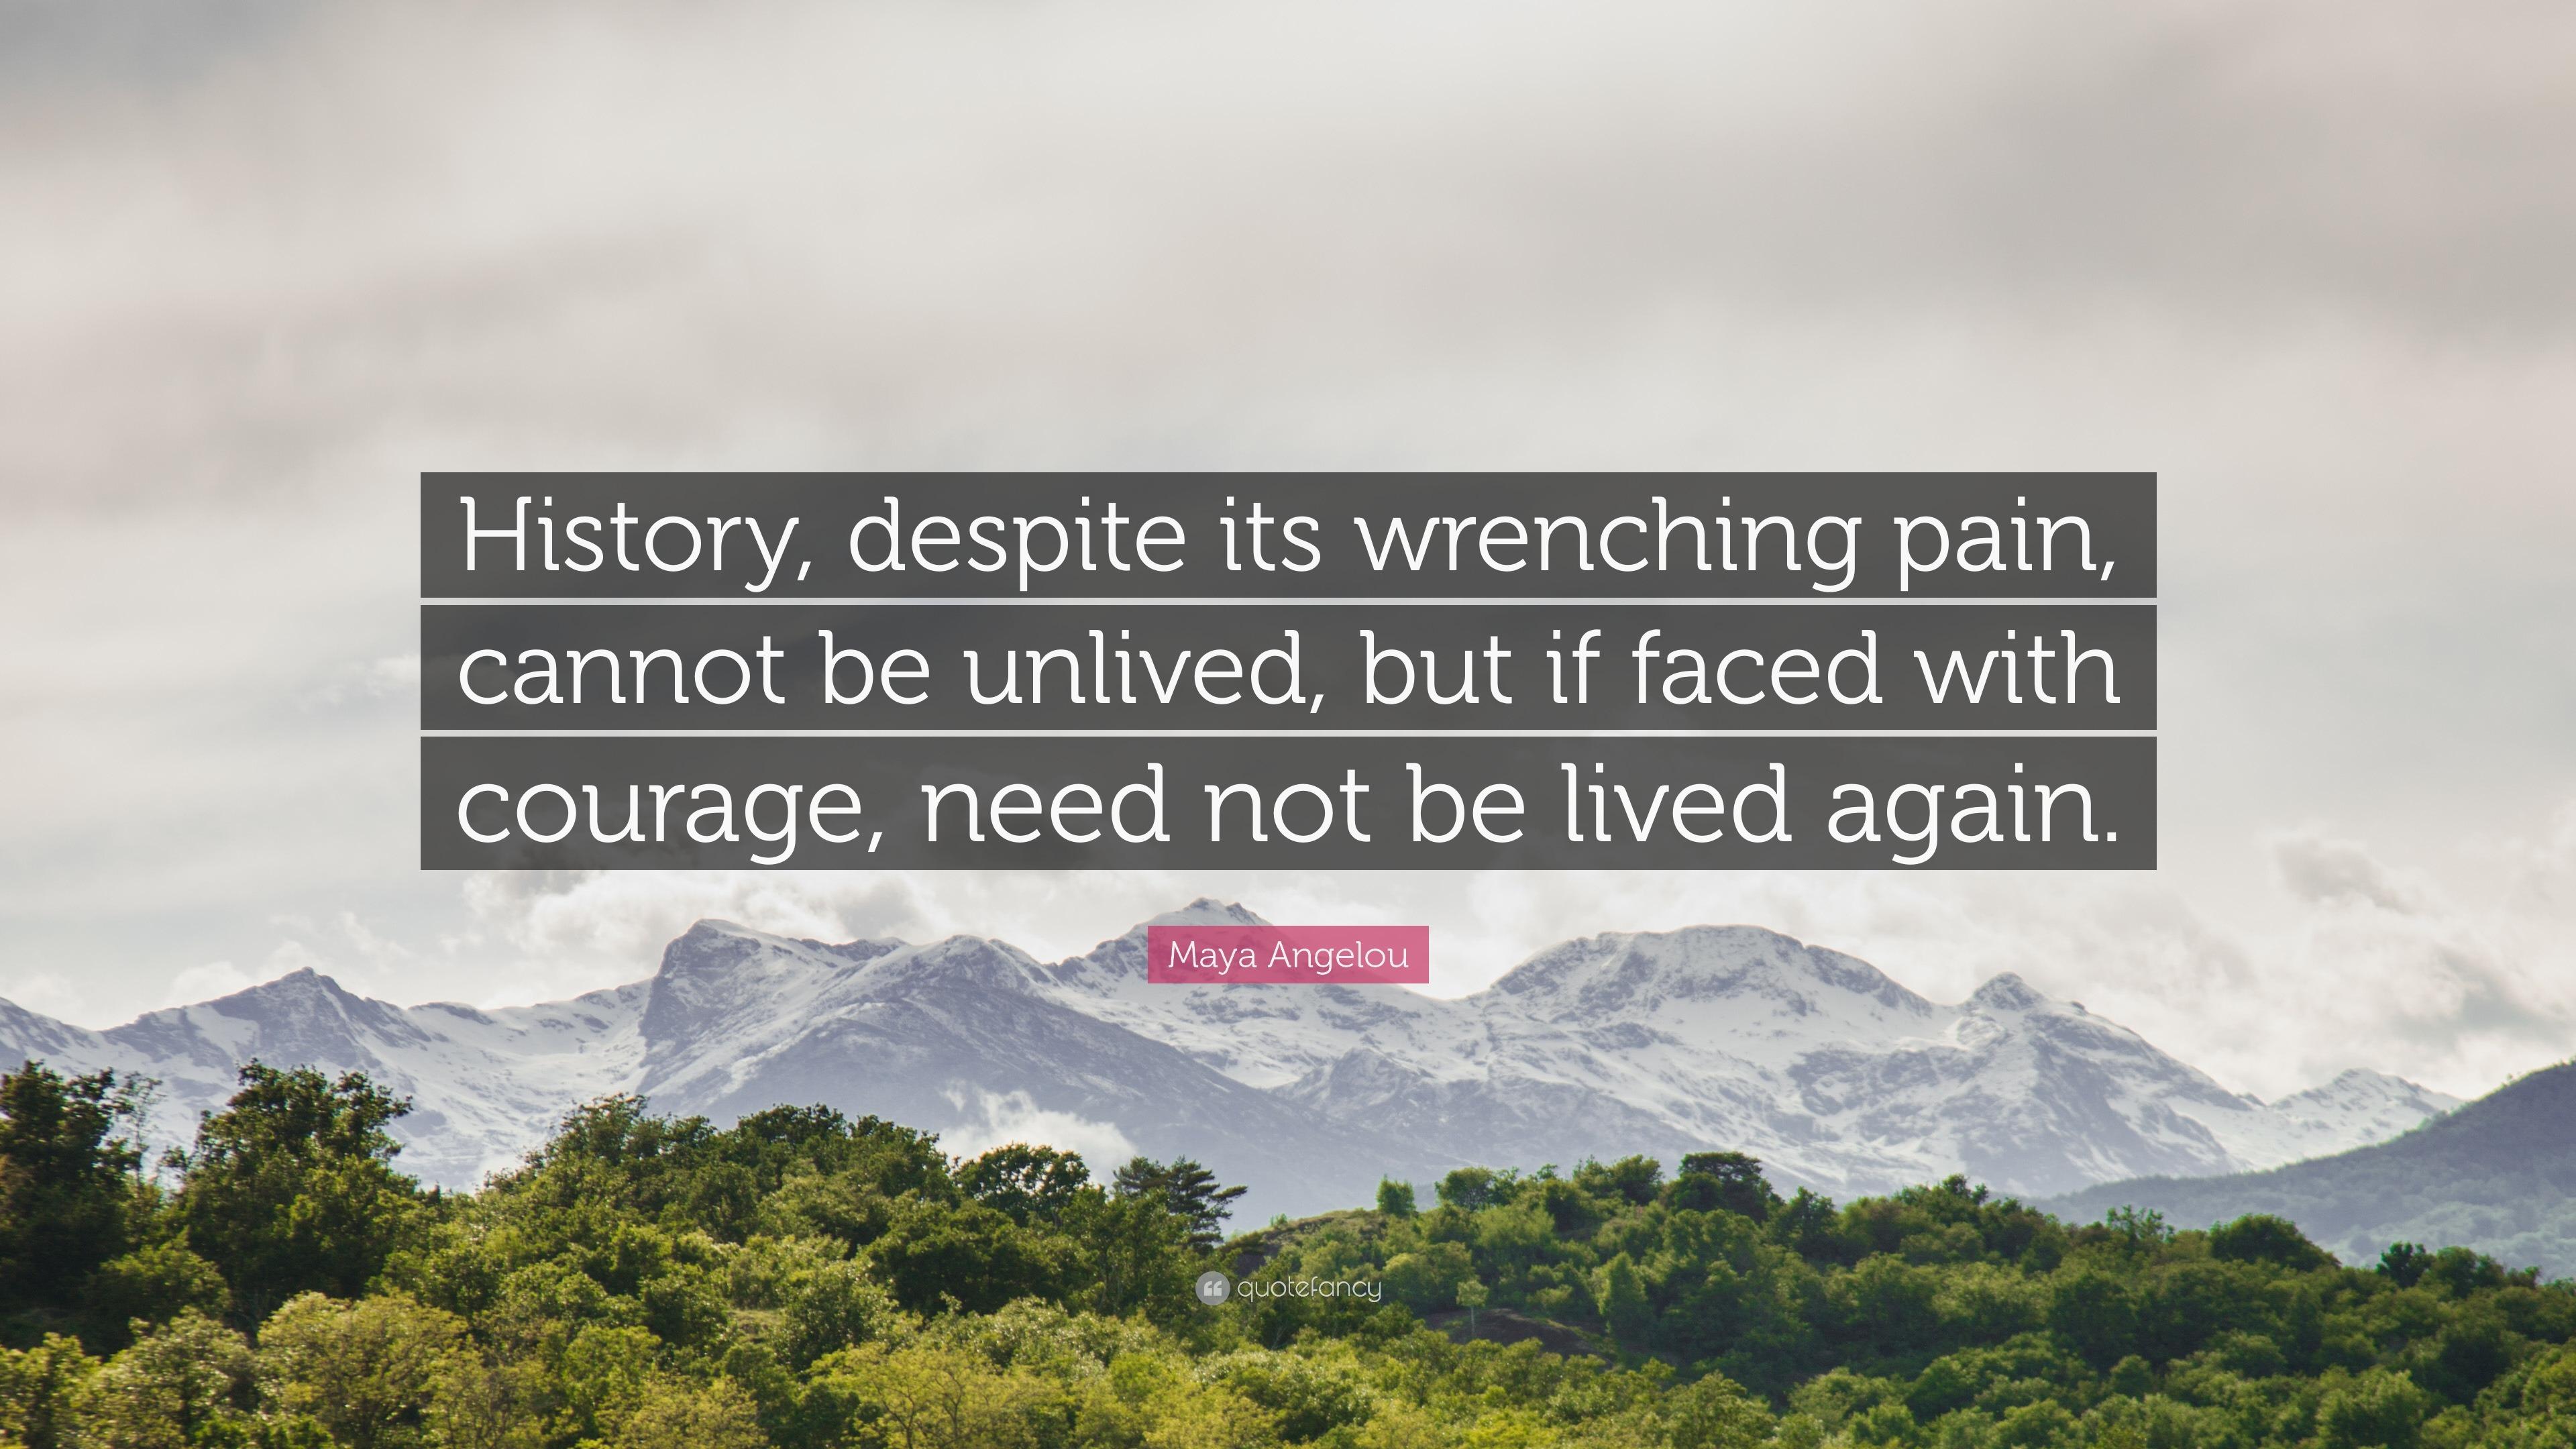 maya angelou history quote